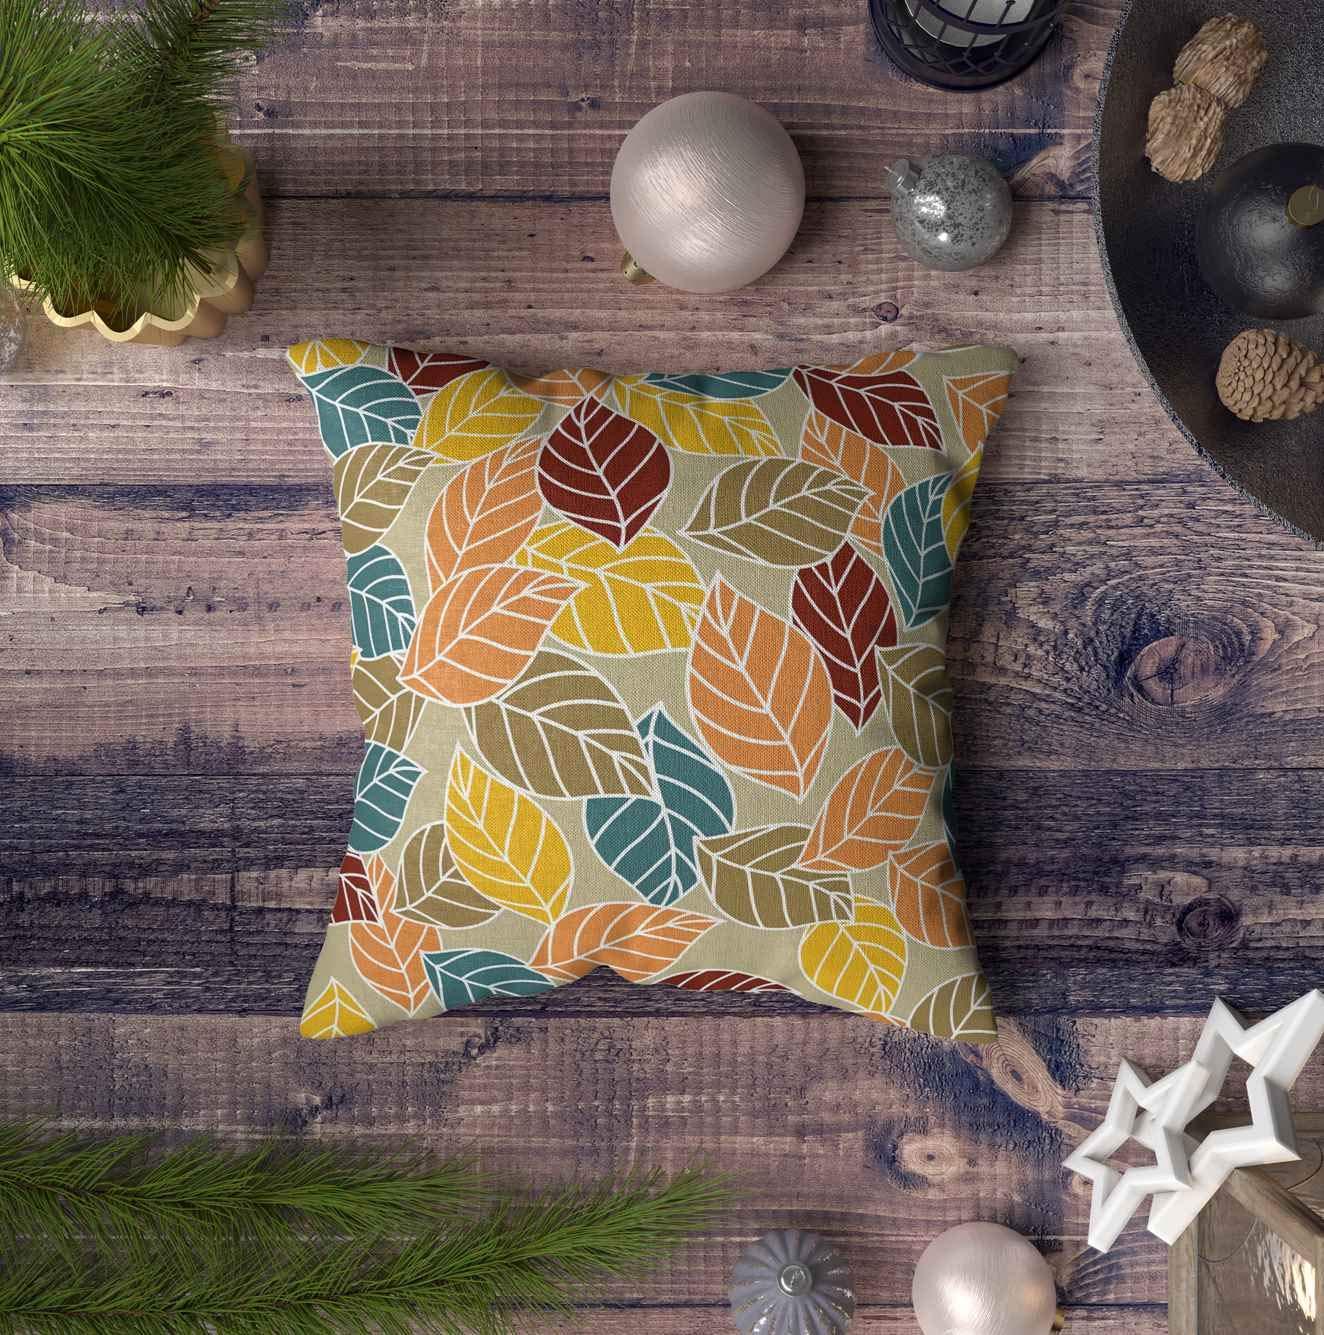 Animal Print Pillow 16x16 Green Turtle Tales E by design PAN466GR28-16 16 x 16 inch